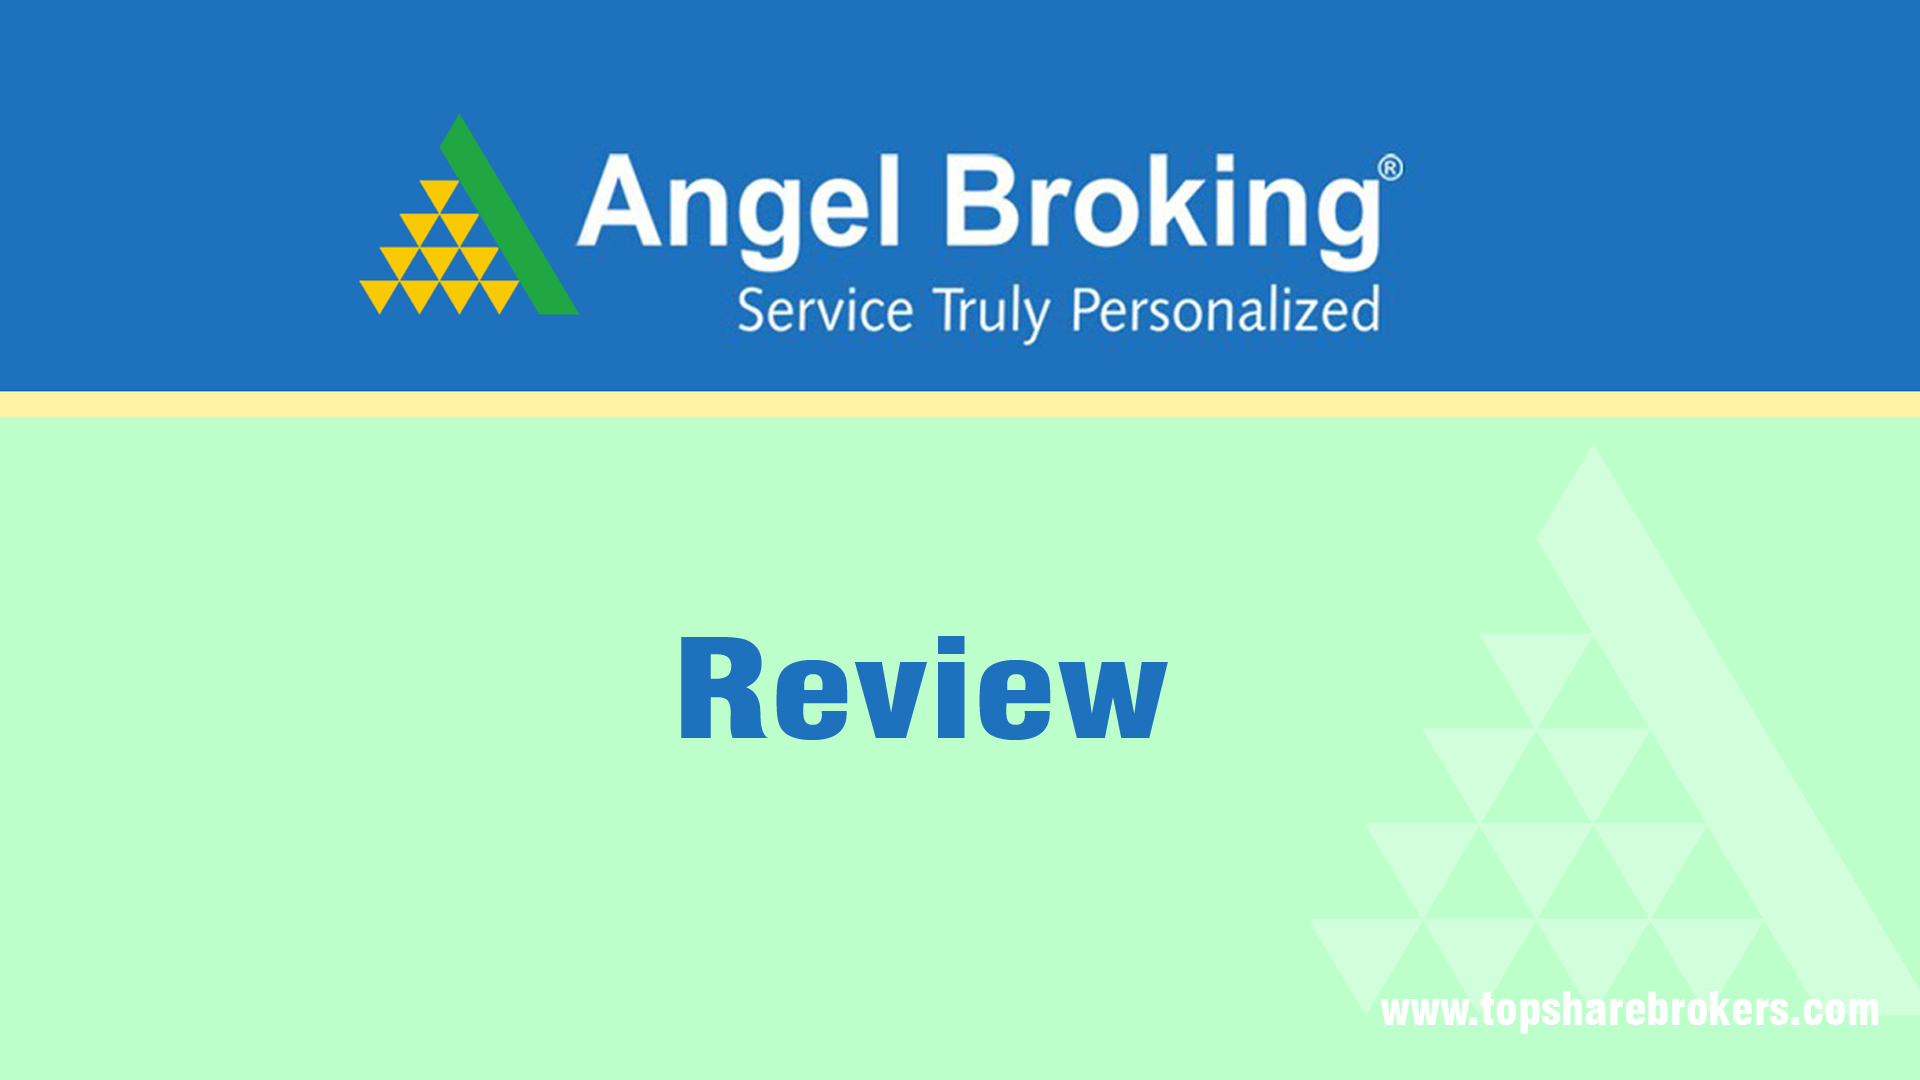 Angel Broking Review Largest Full Service Broker